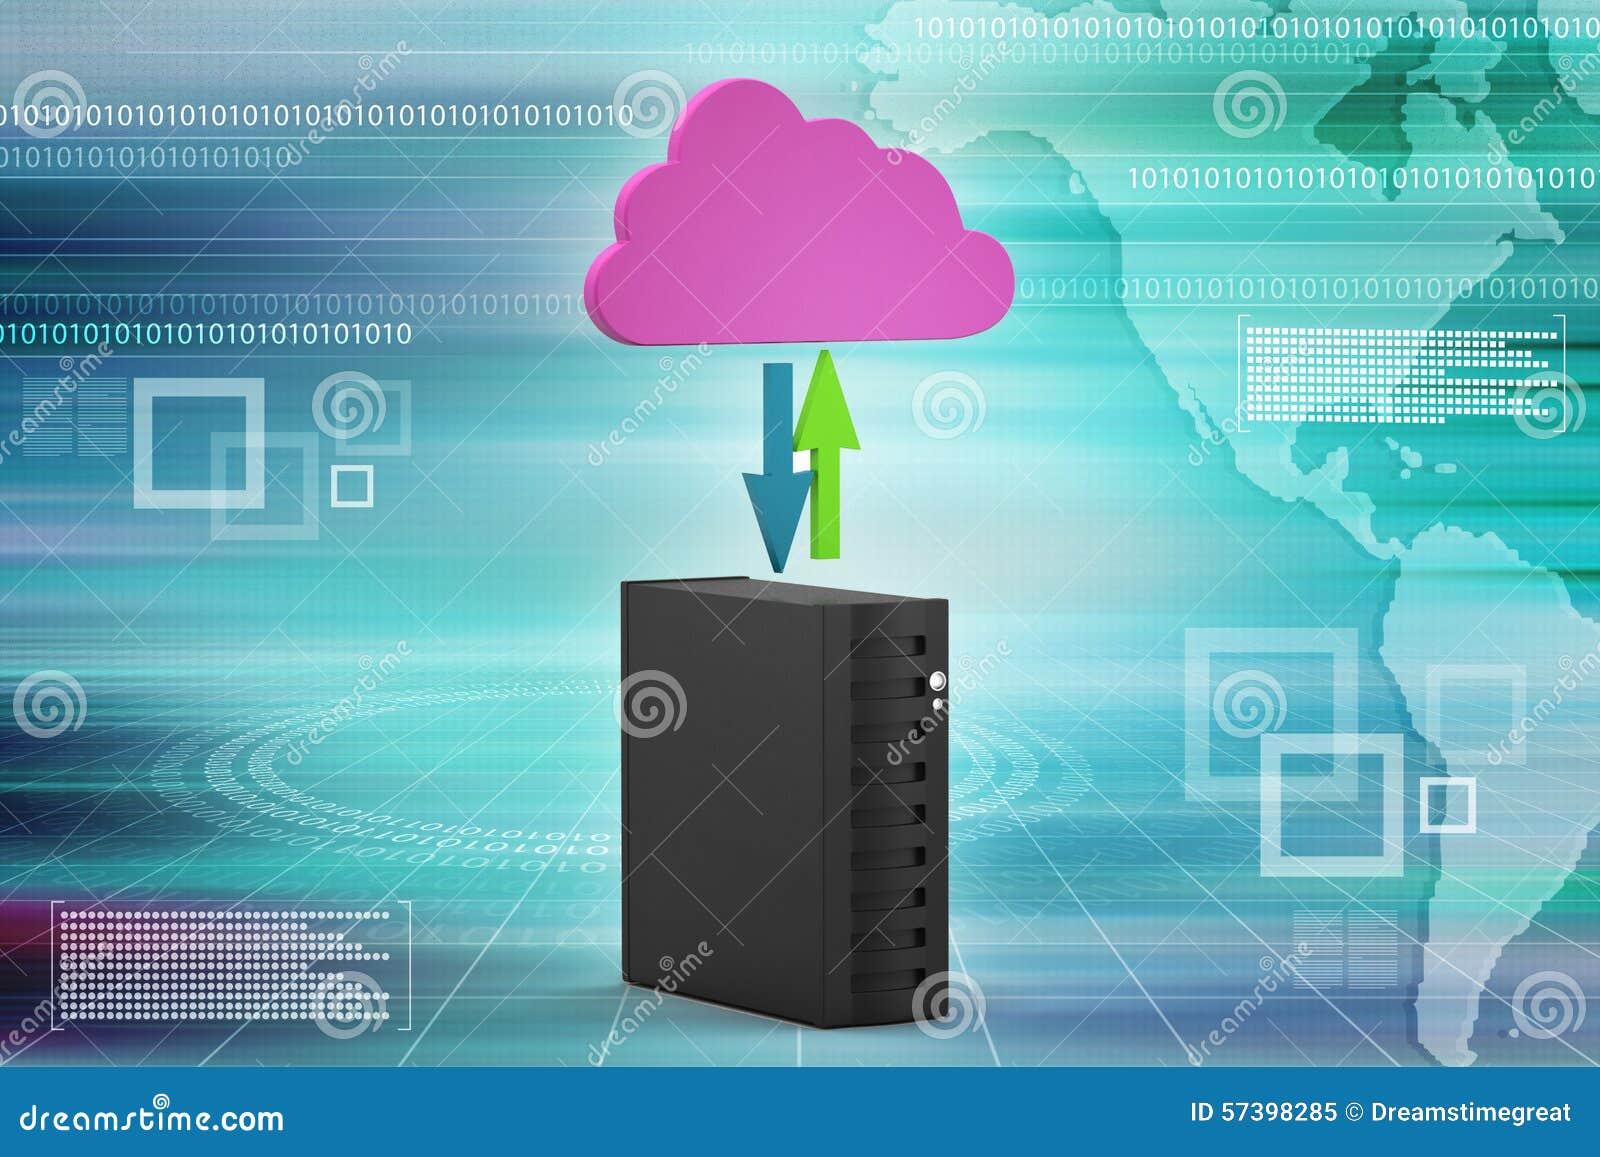 Wolkenconcept met server